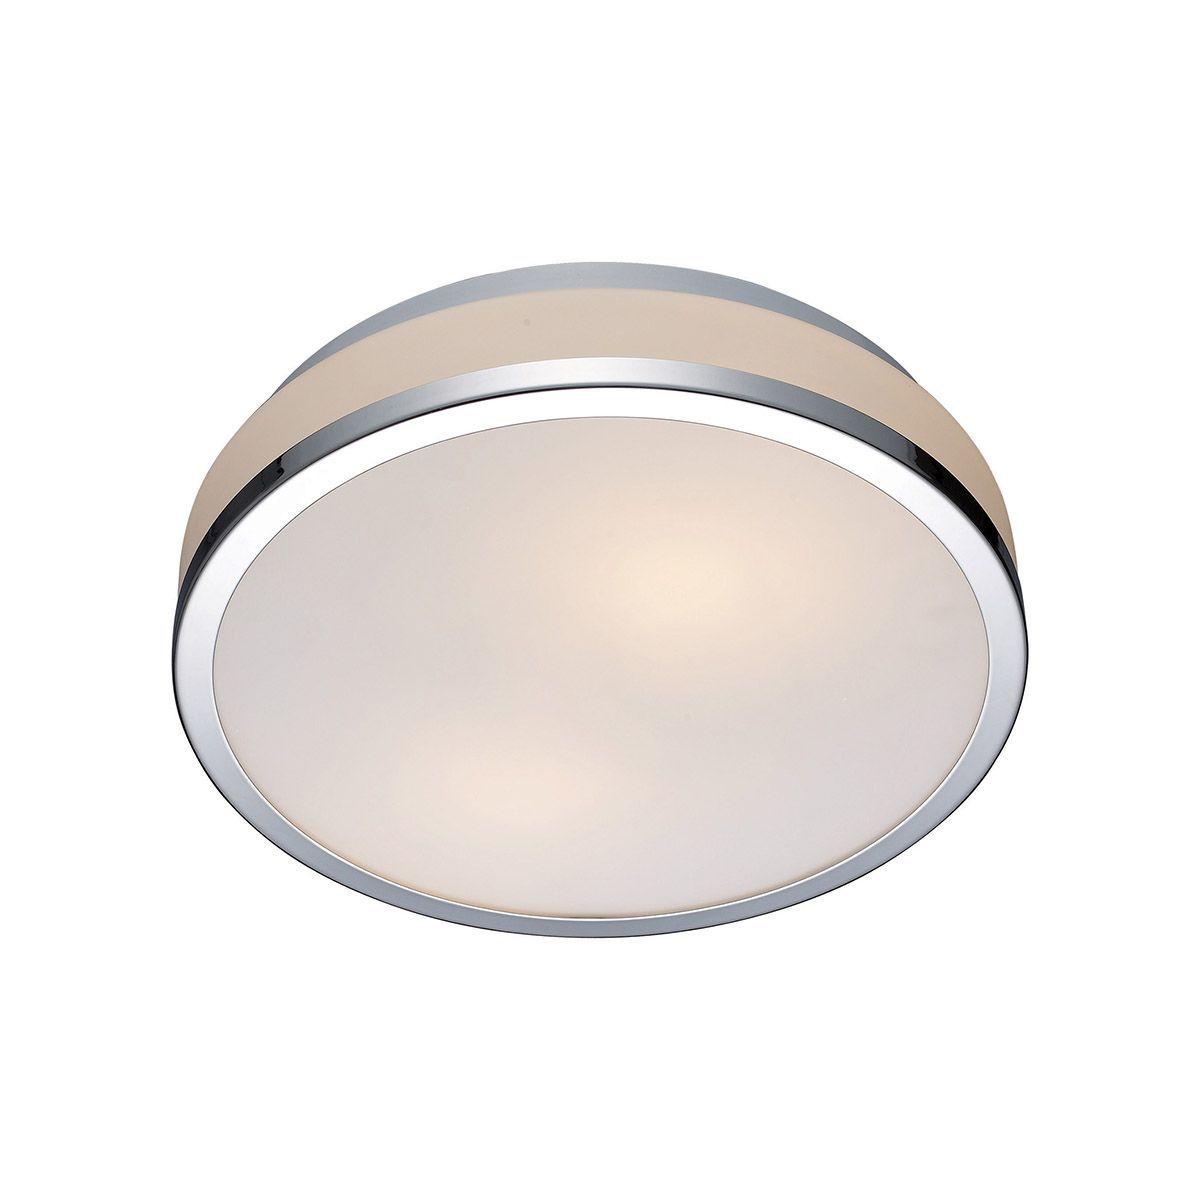 ITALUX LAMPA PLAFON CAMRY 5007-S